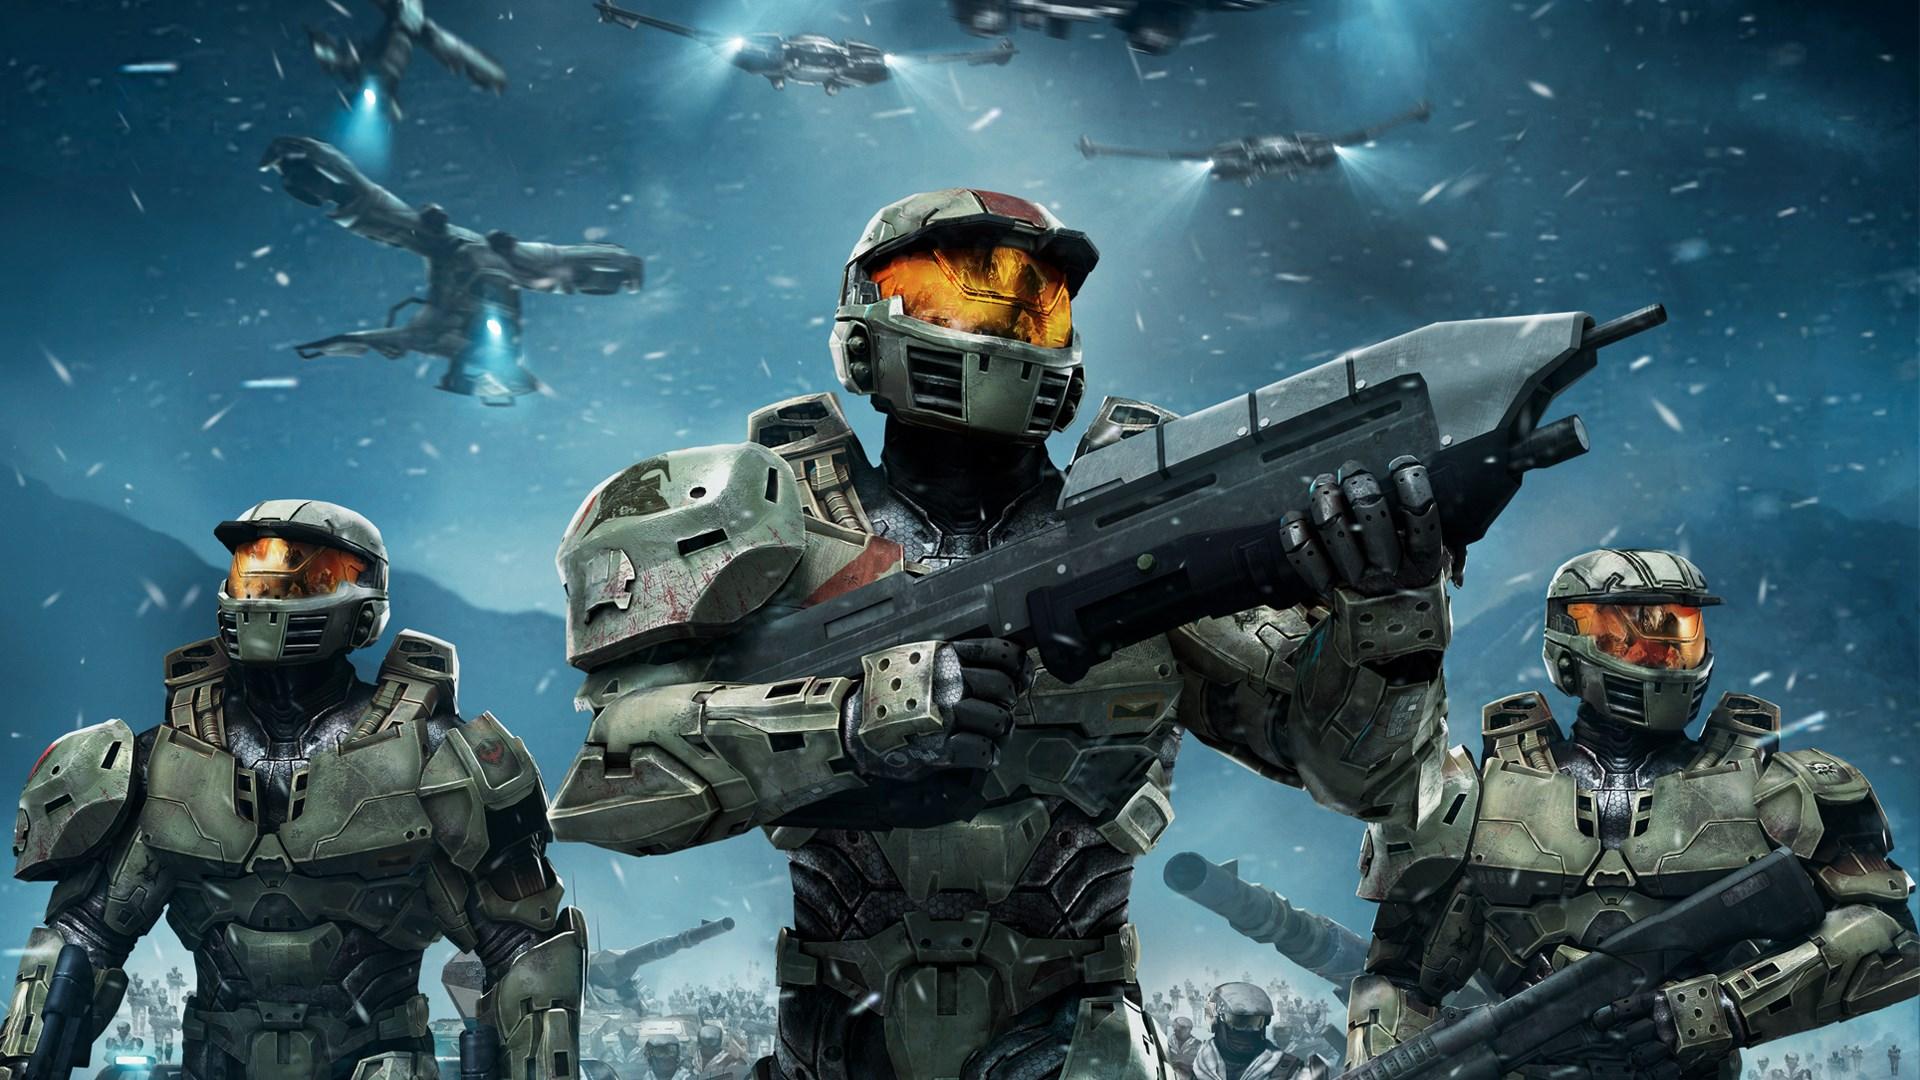 Halo Wars Definitive Edition